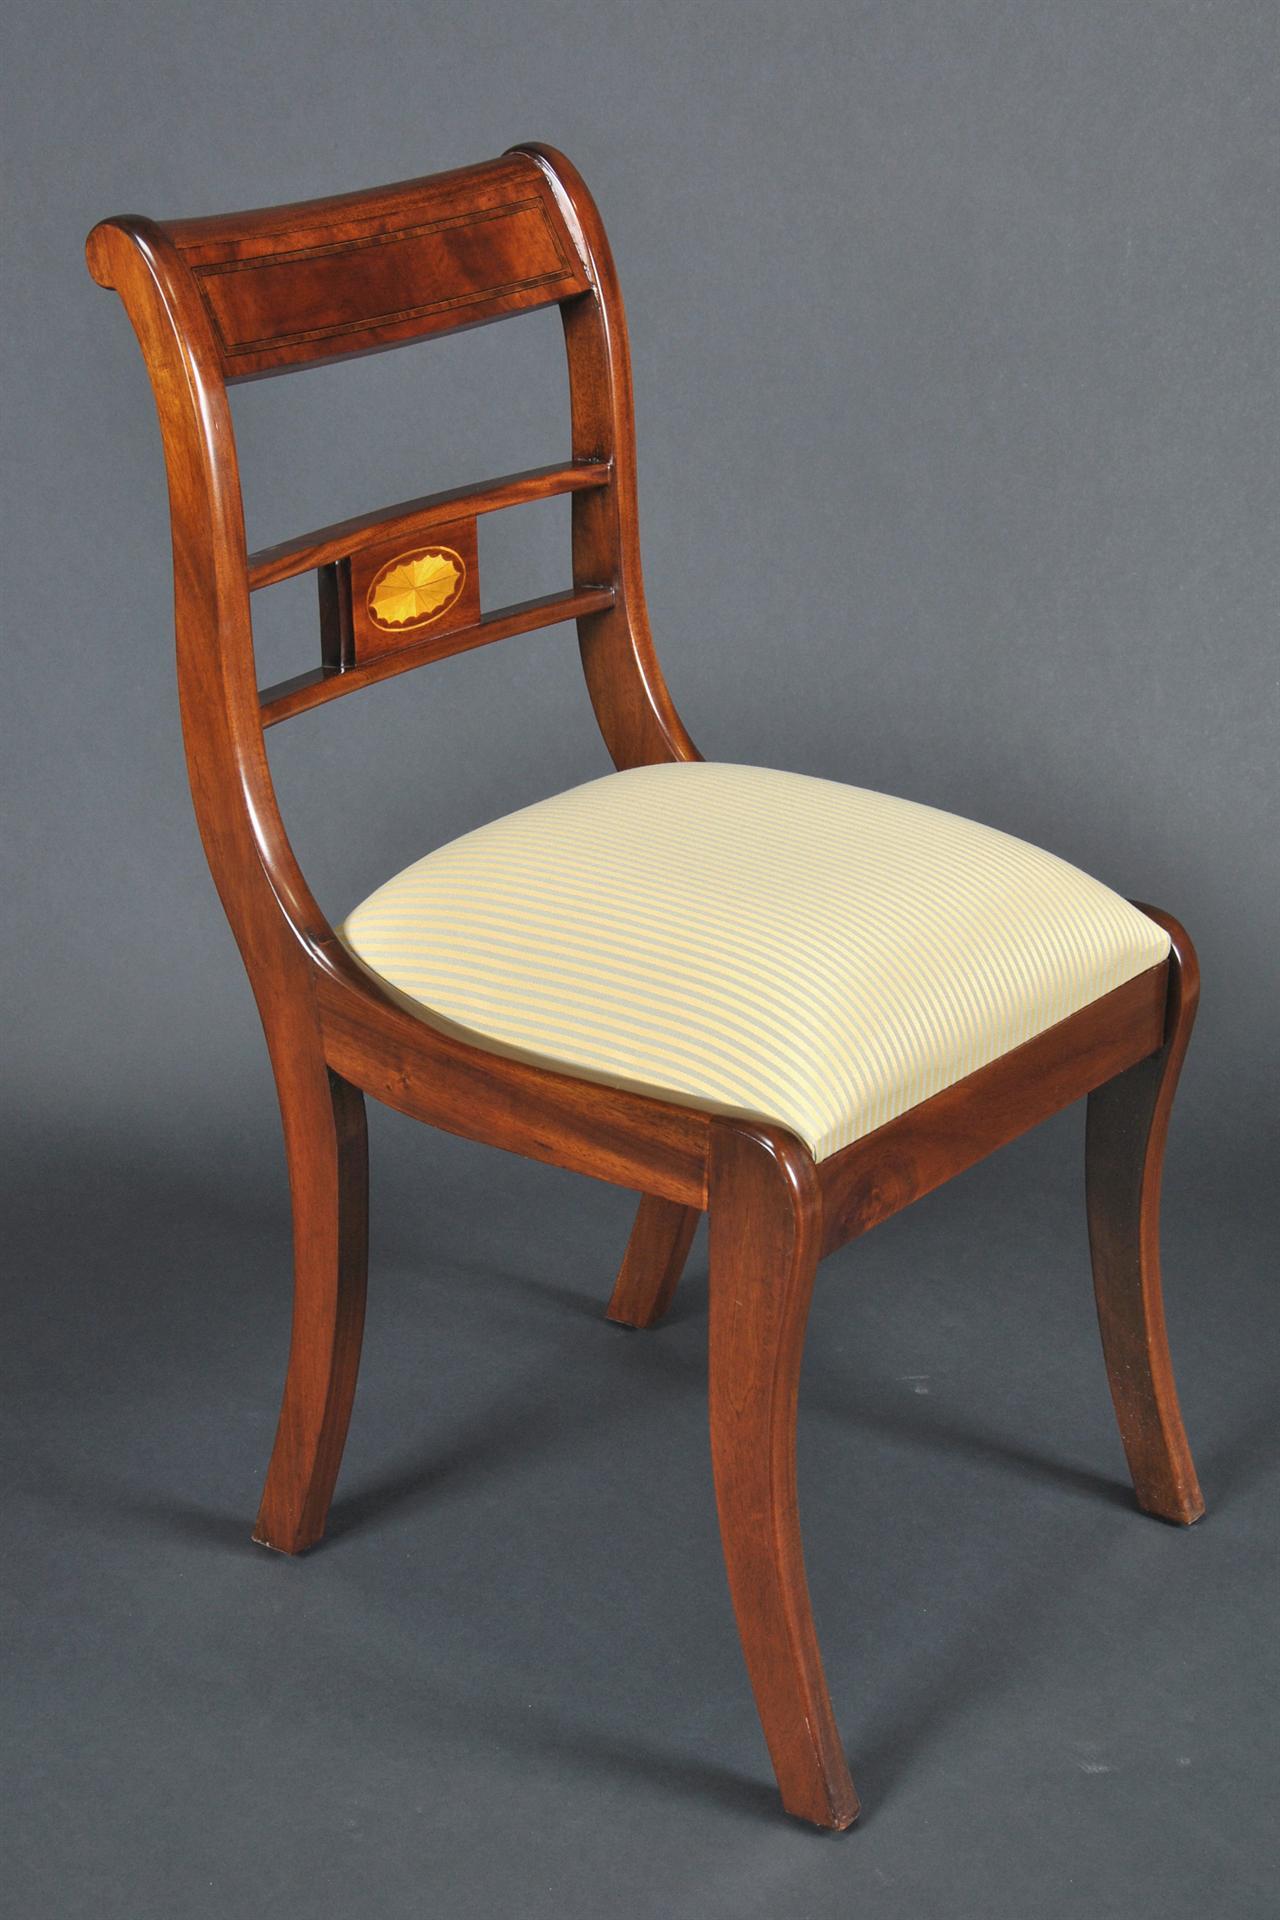 duncan phyfe chairs polka dot bean bag chair bing images